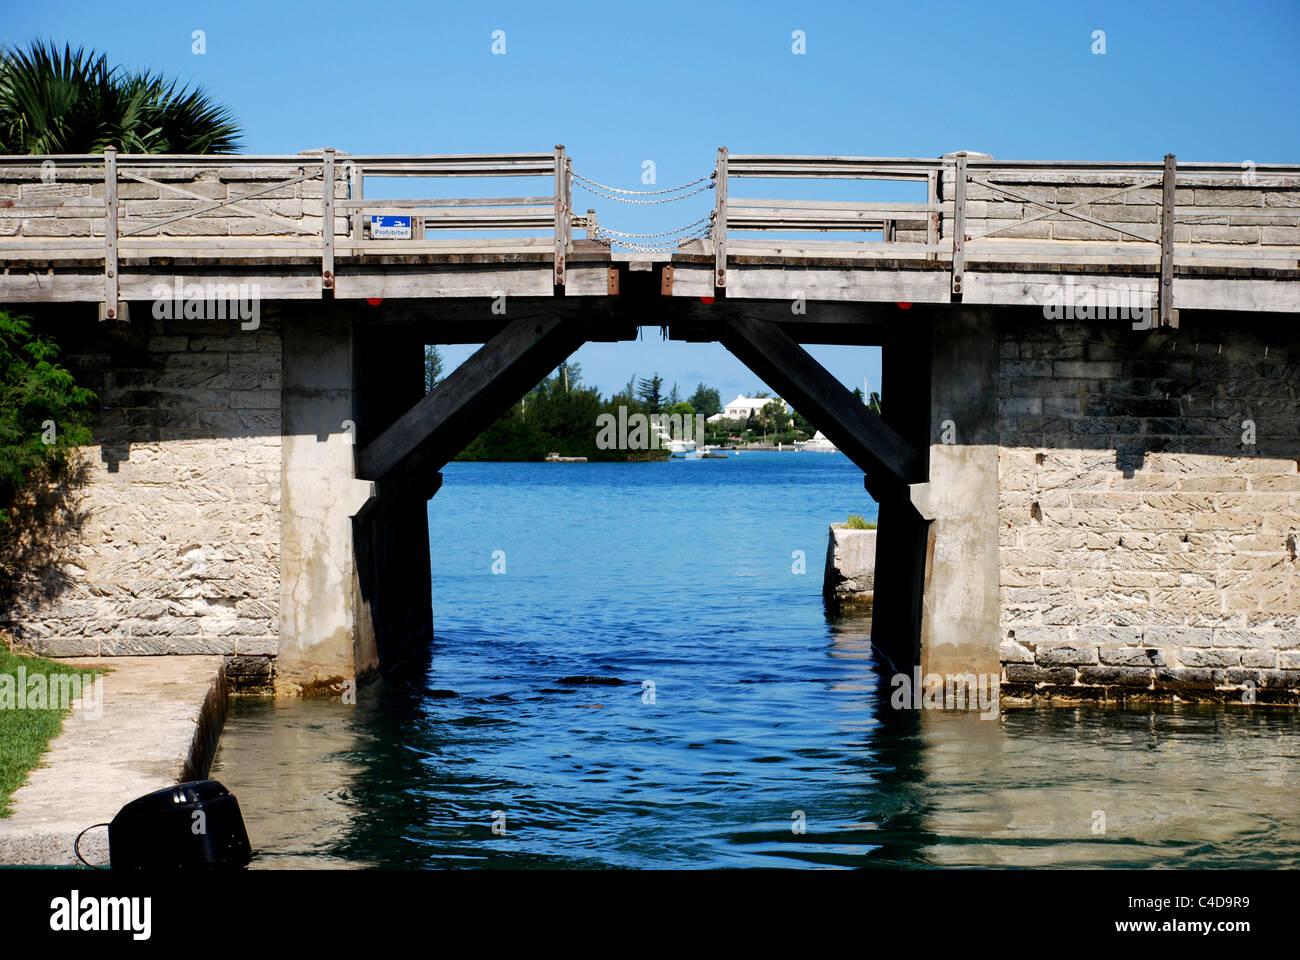 Somerset Bridge; Bermuda, World's smallest drawbridge - Stock Image